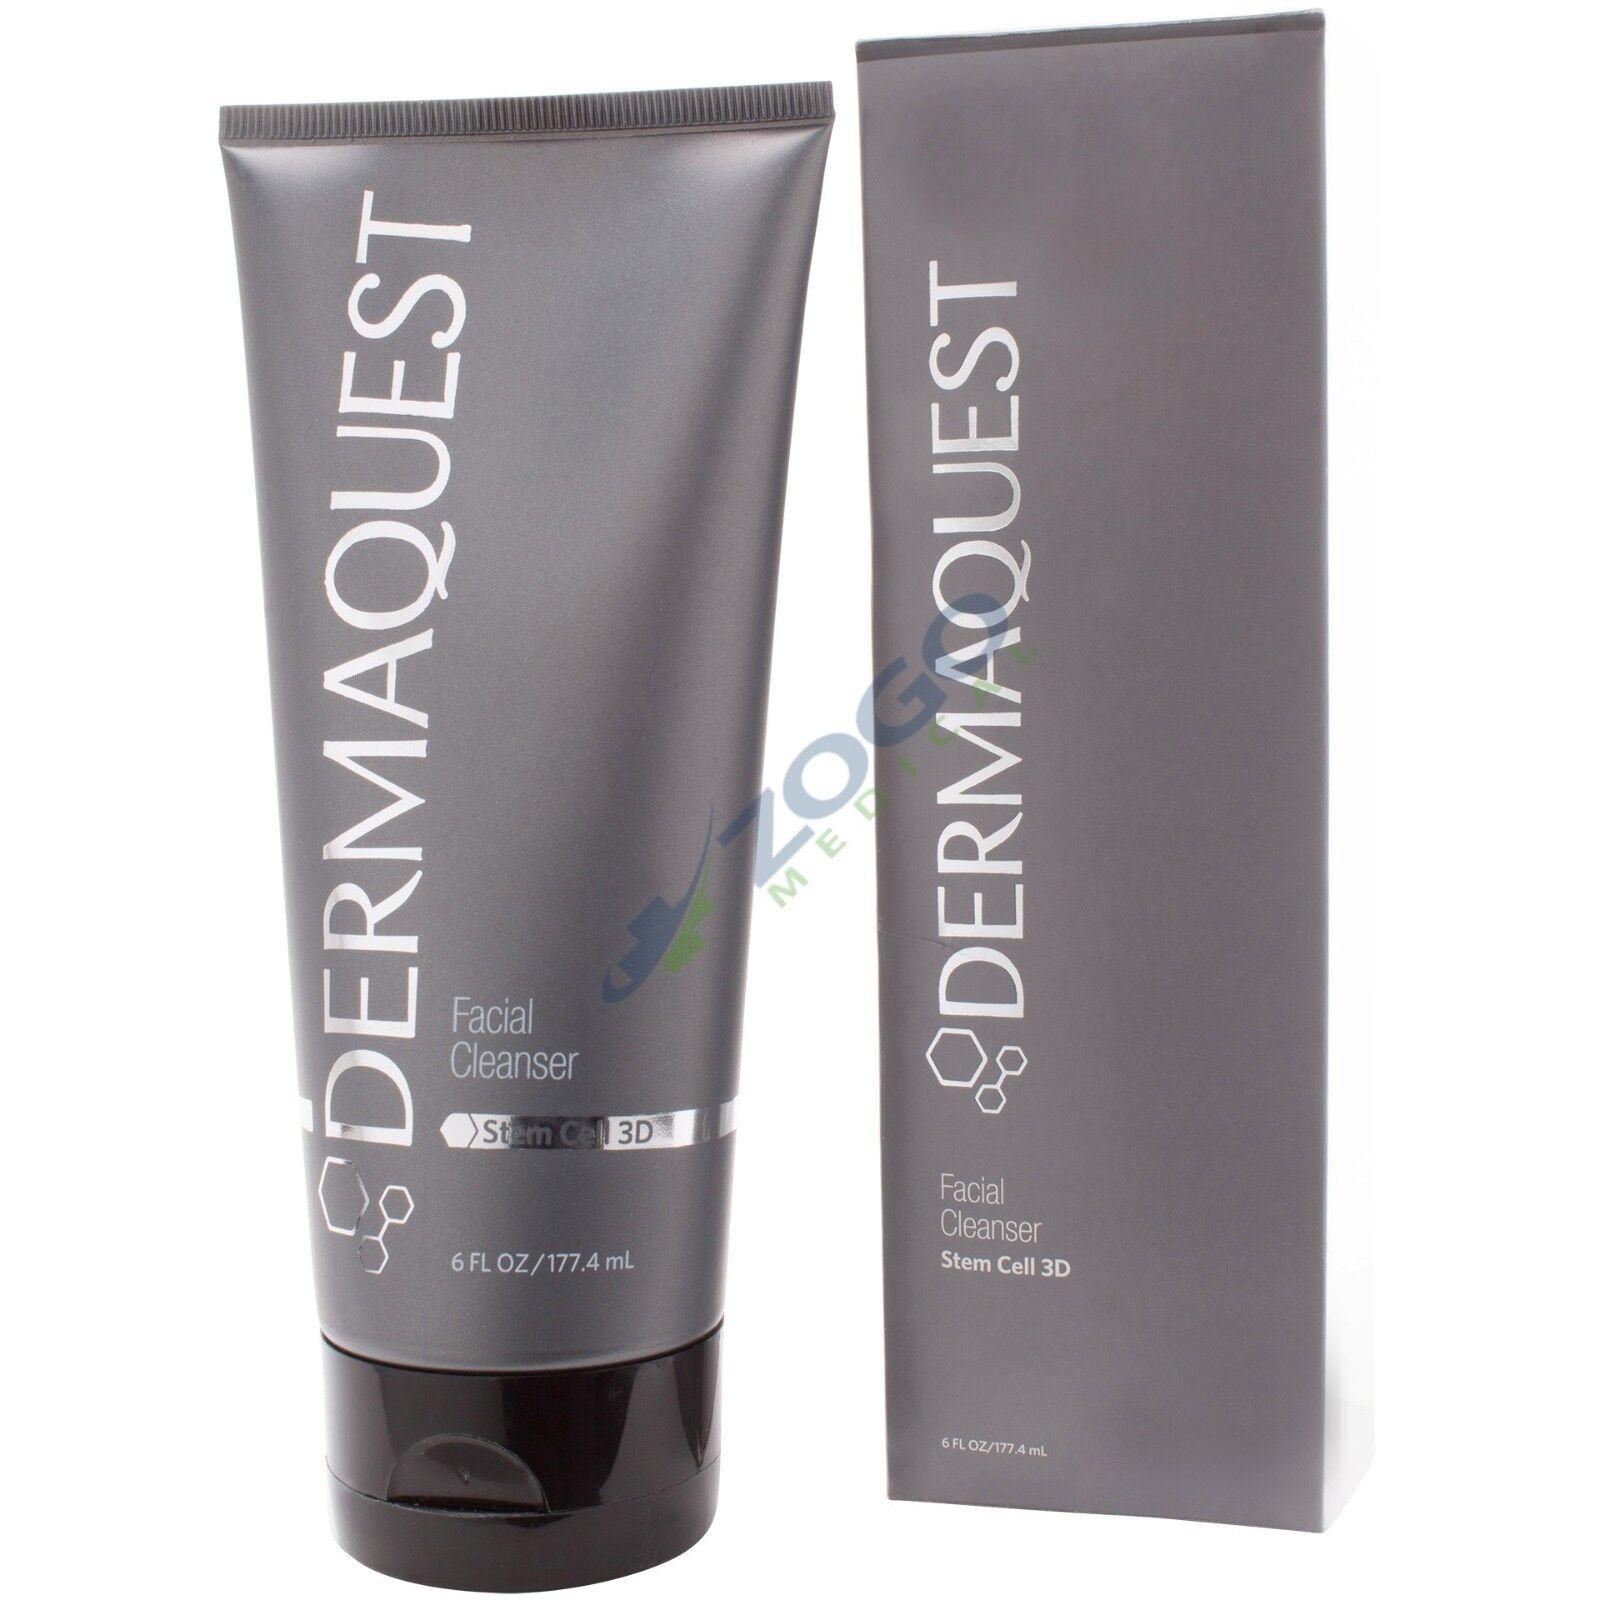 929c7c5b226c0f Details about DermaQuest Stem Cell 3D Facial Cleanser 6 oz - New in Box